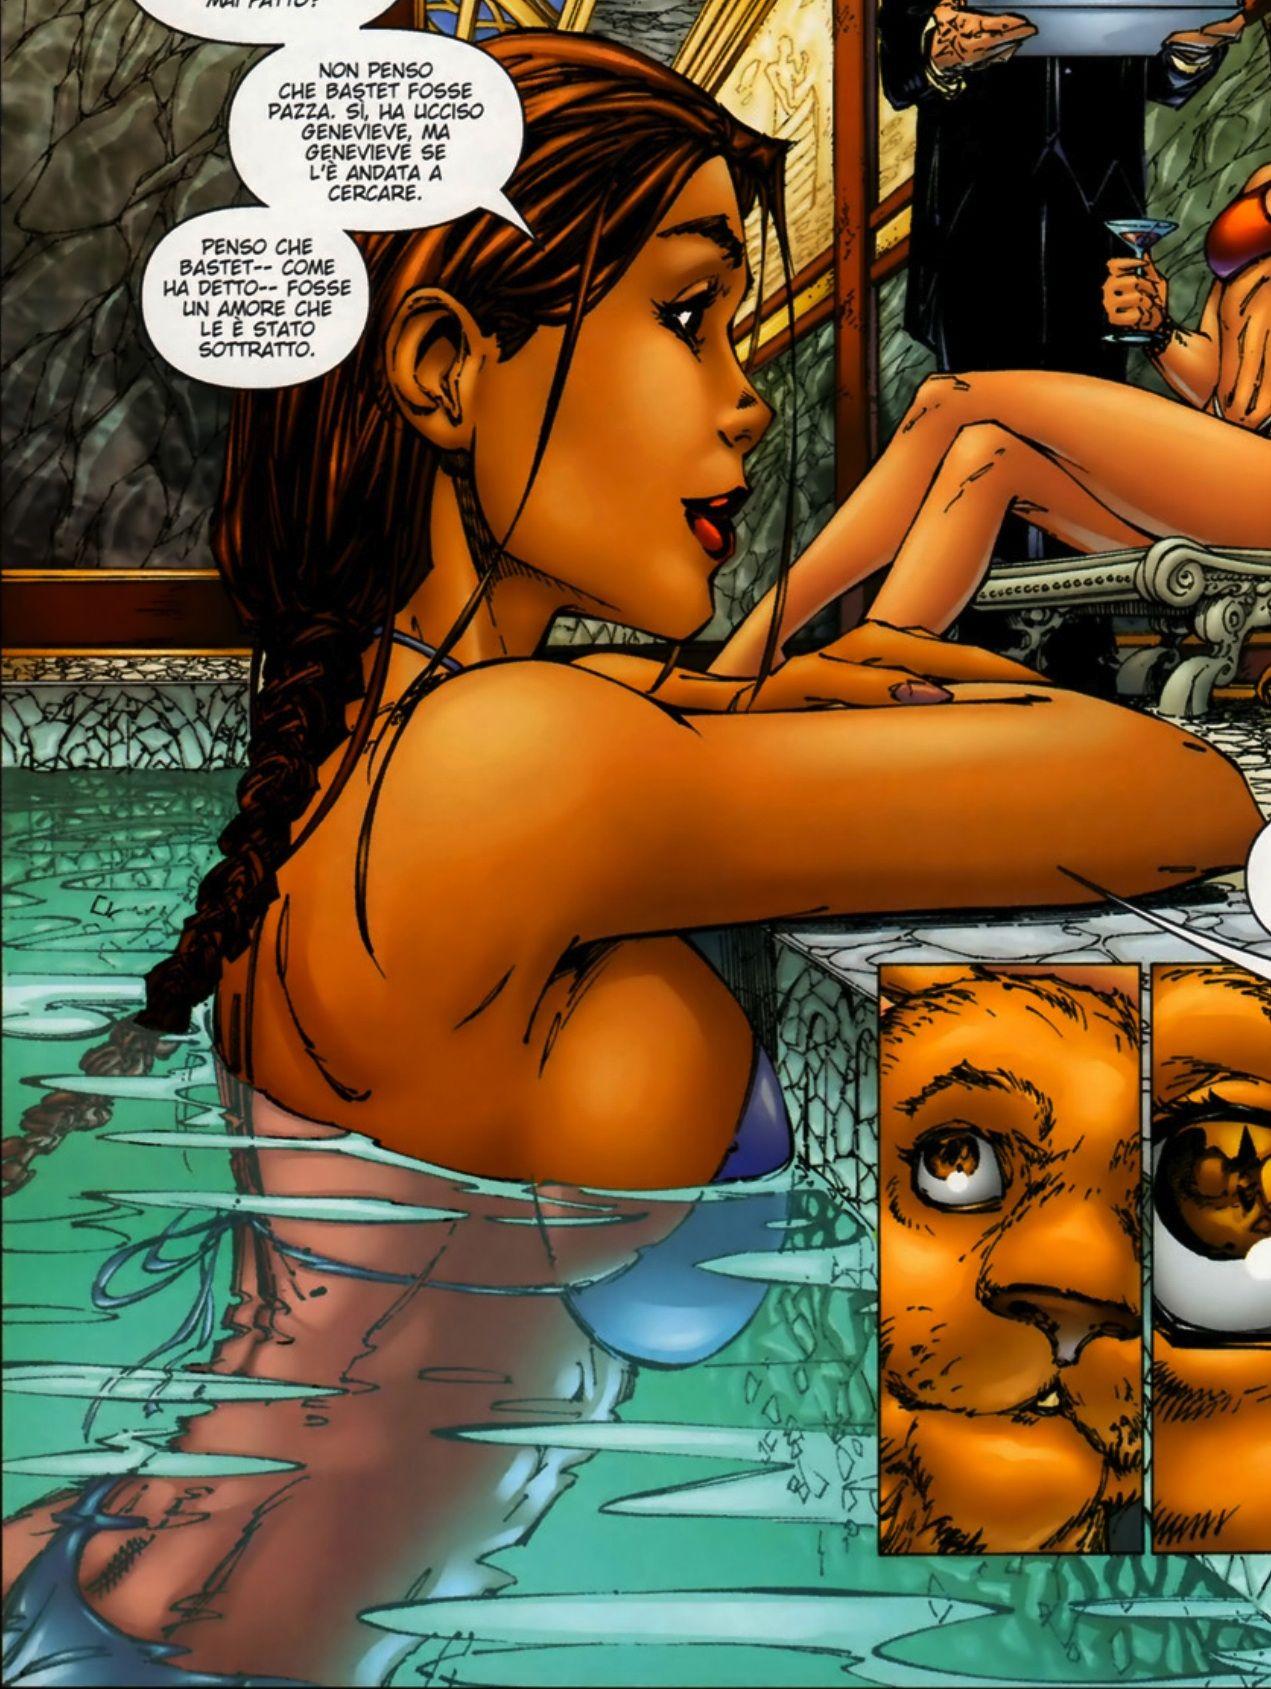 Teresa palmer nude pics